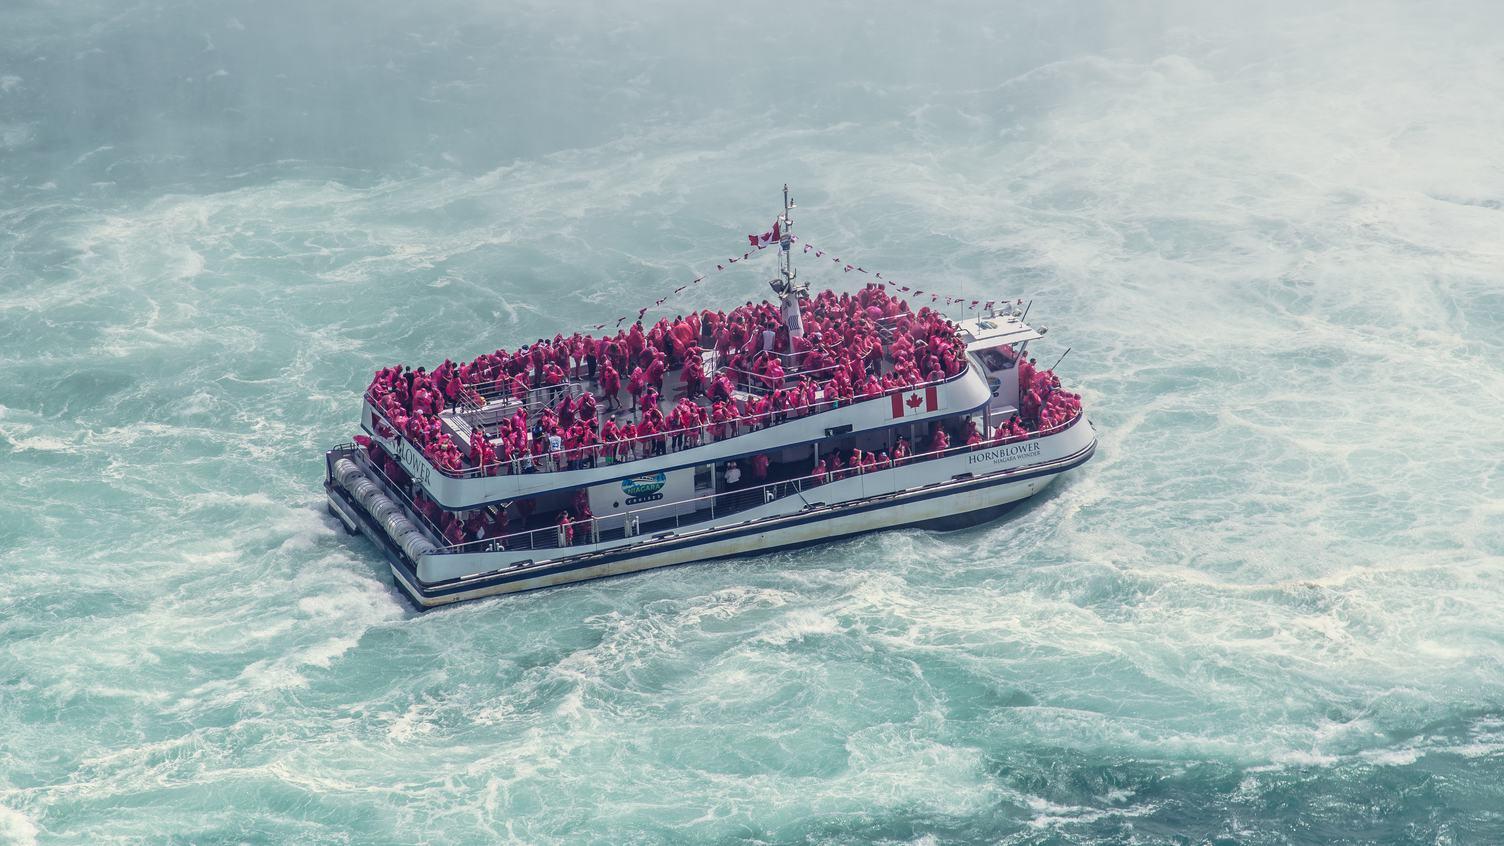 Niagara Trip - Boat Full of People Wearing Red Raincoats